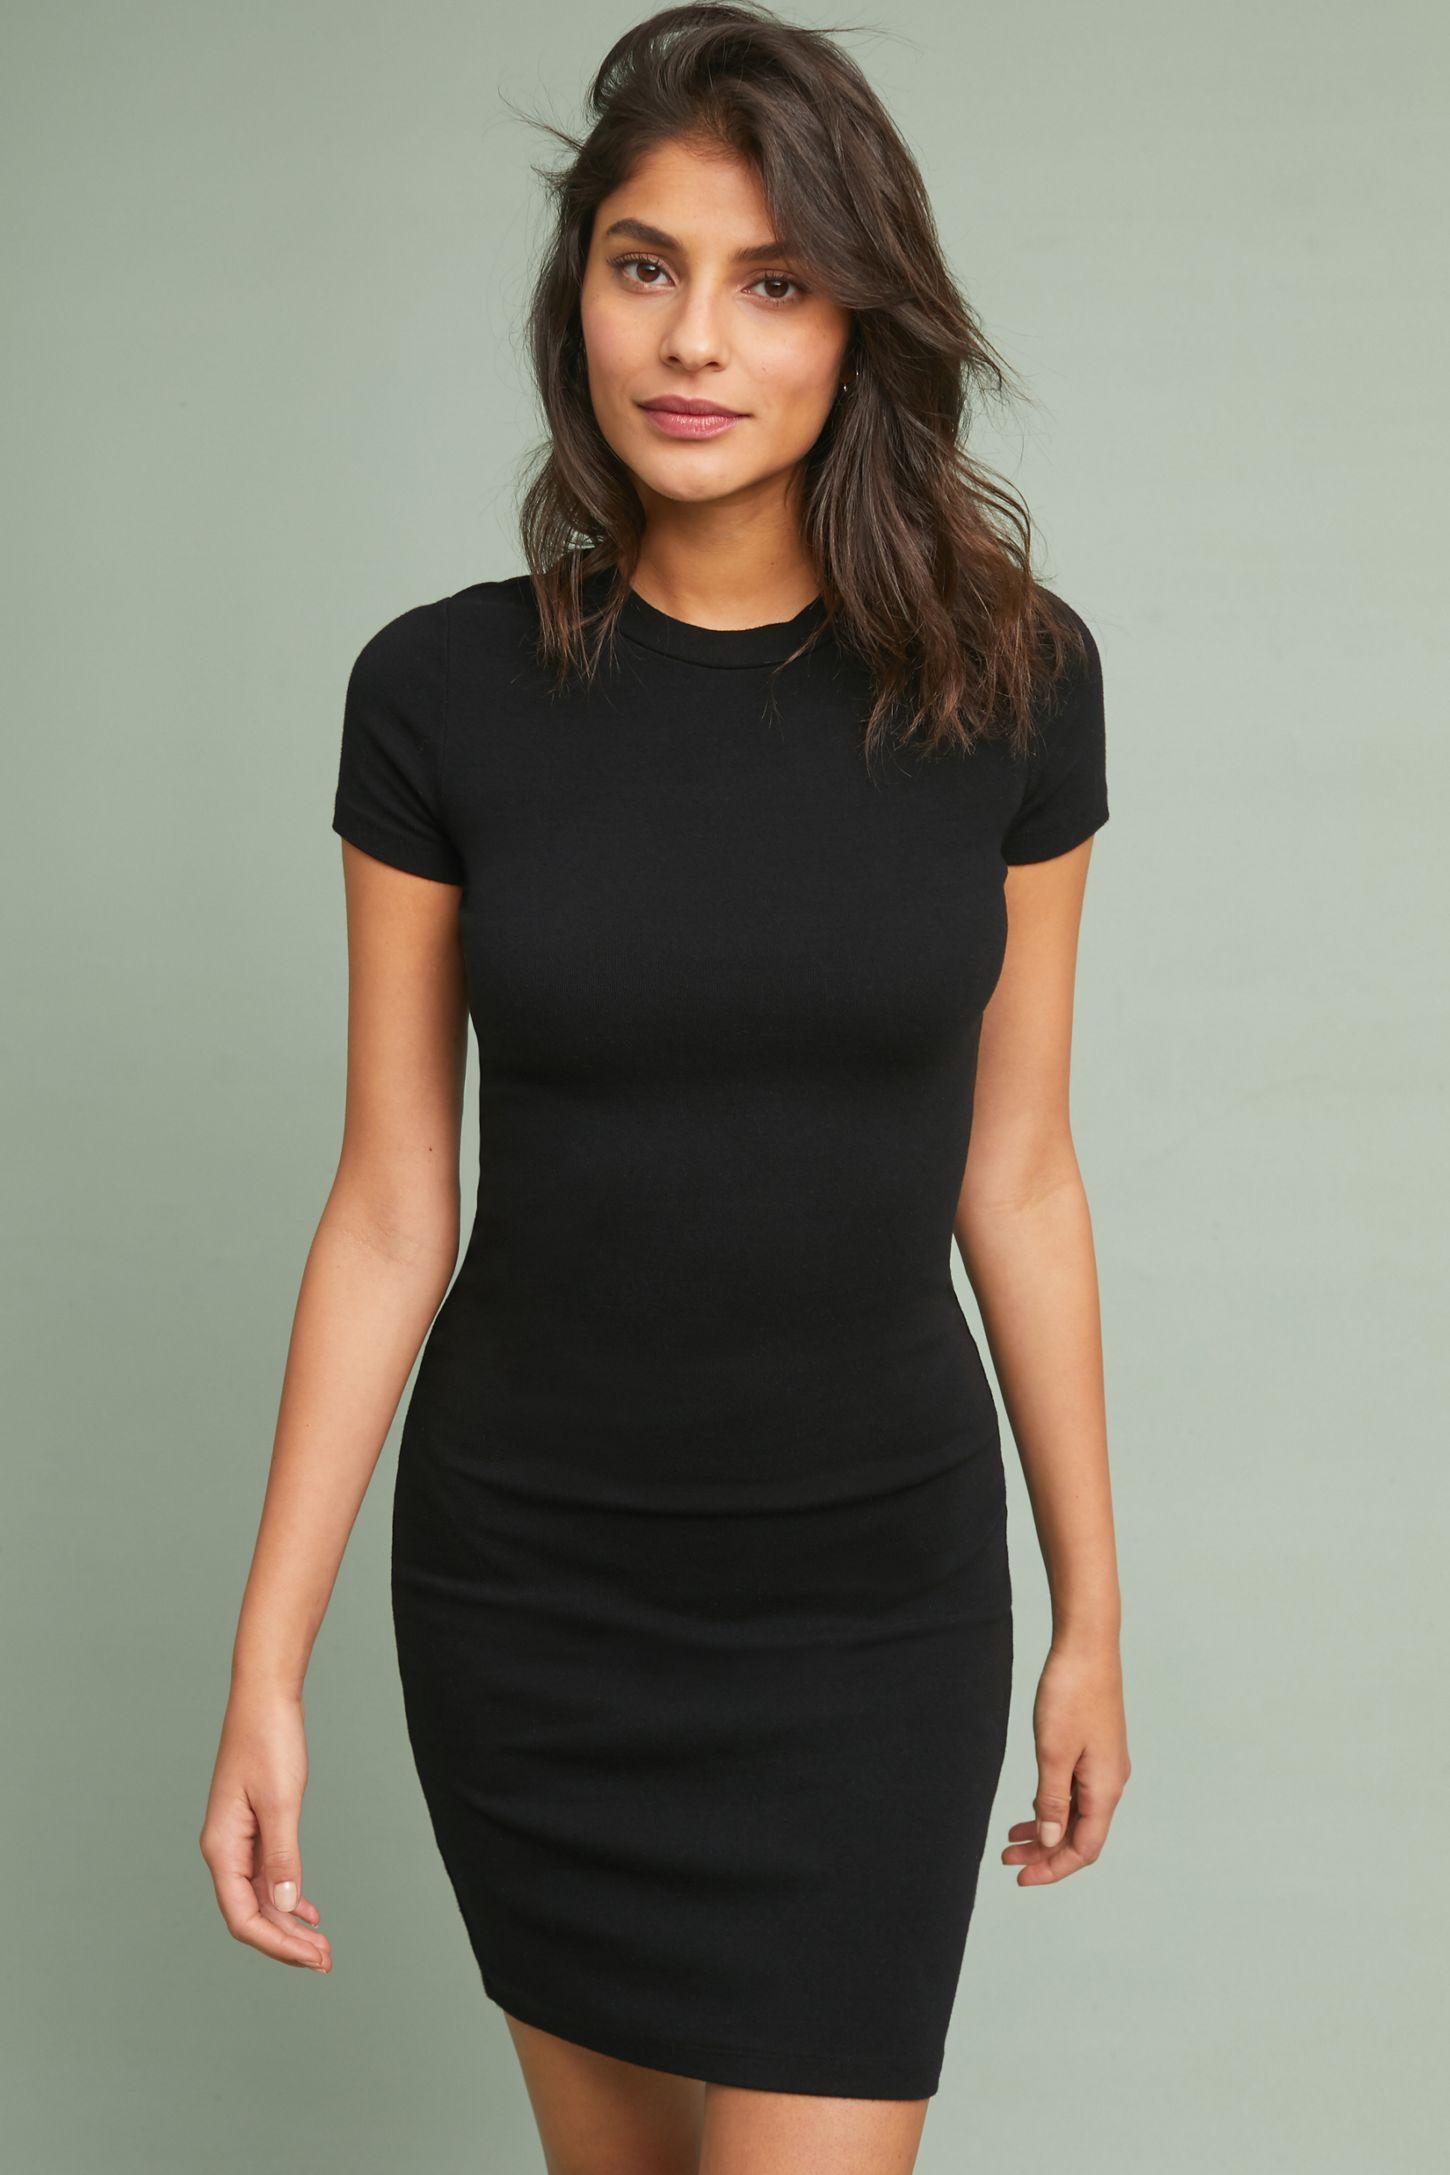 7f2ffd0e67b Stateside T-Shirt Dress | Anthropologie